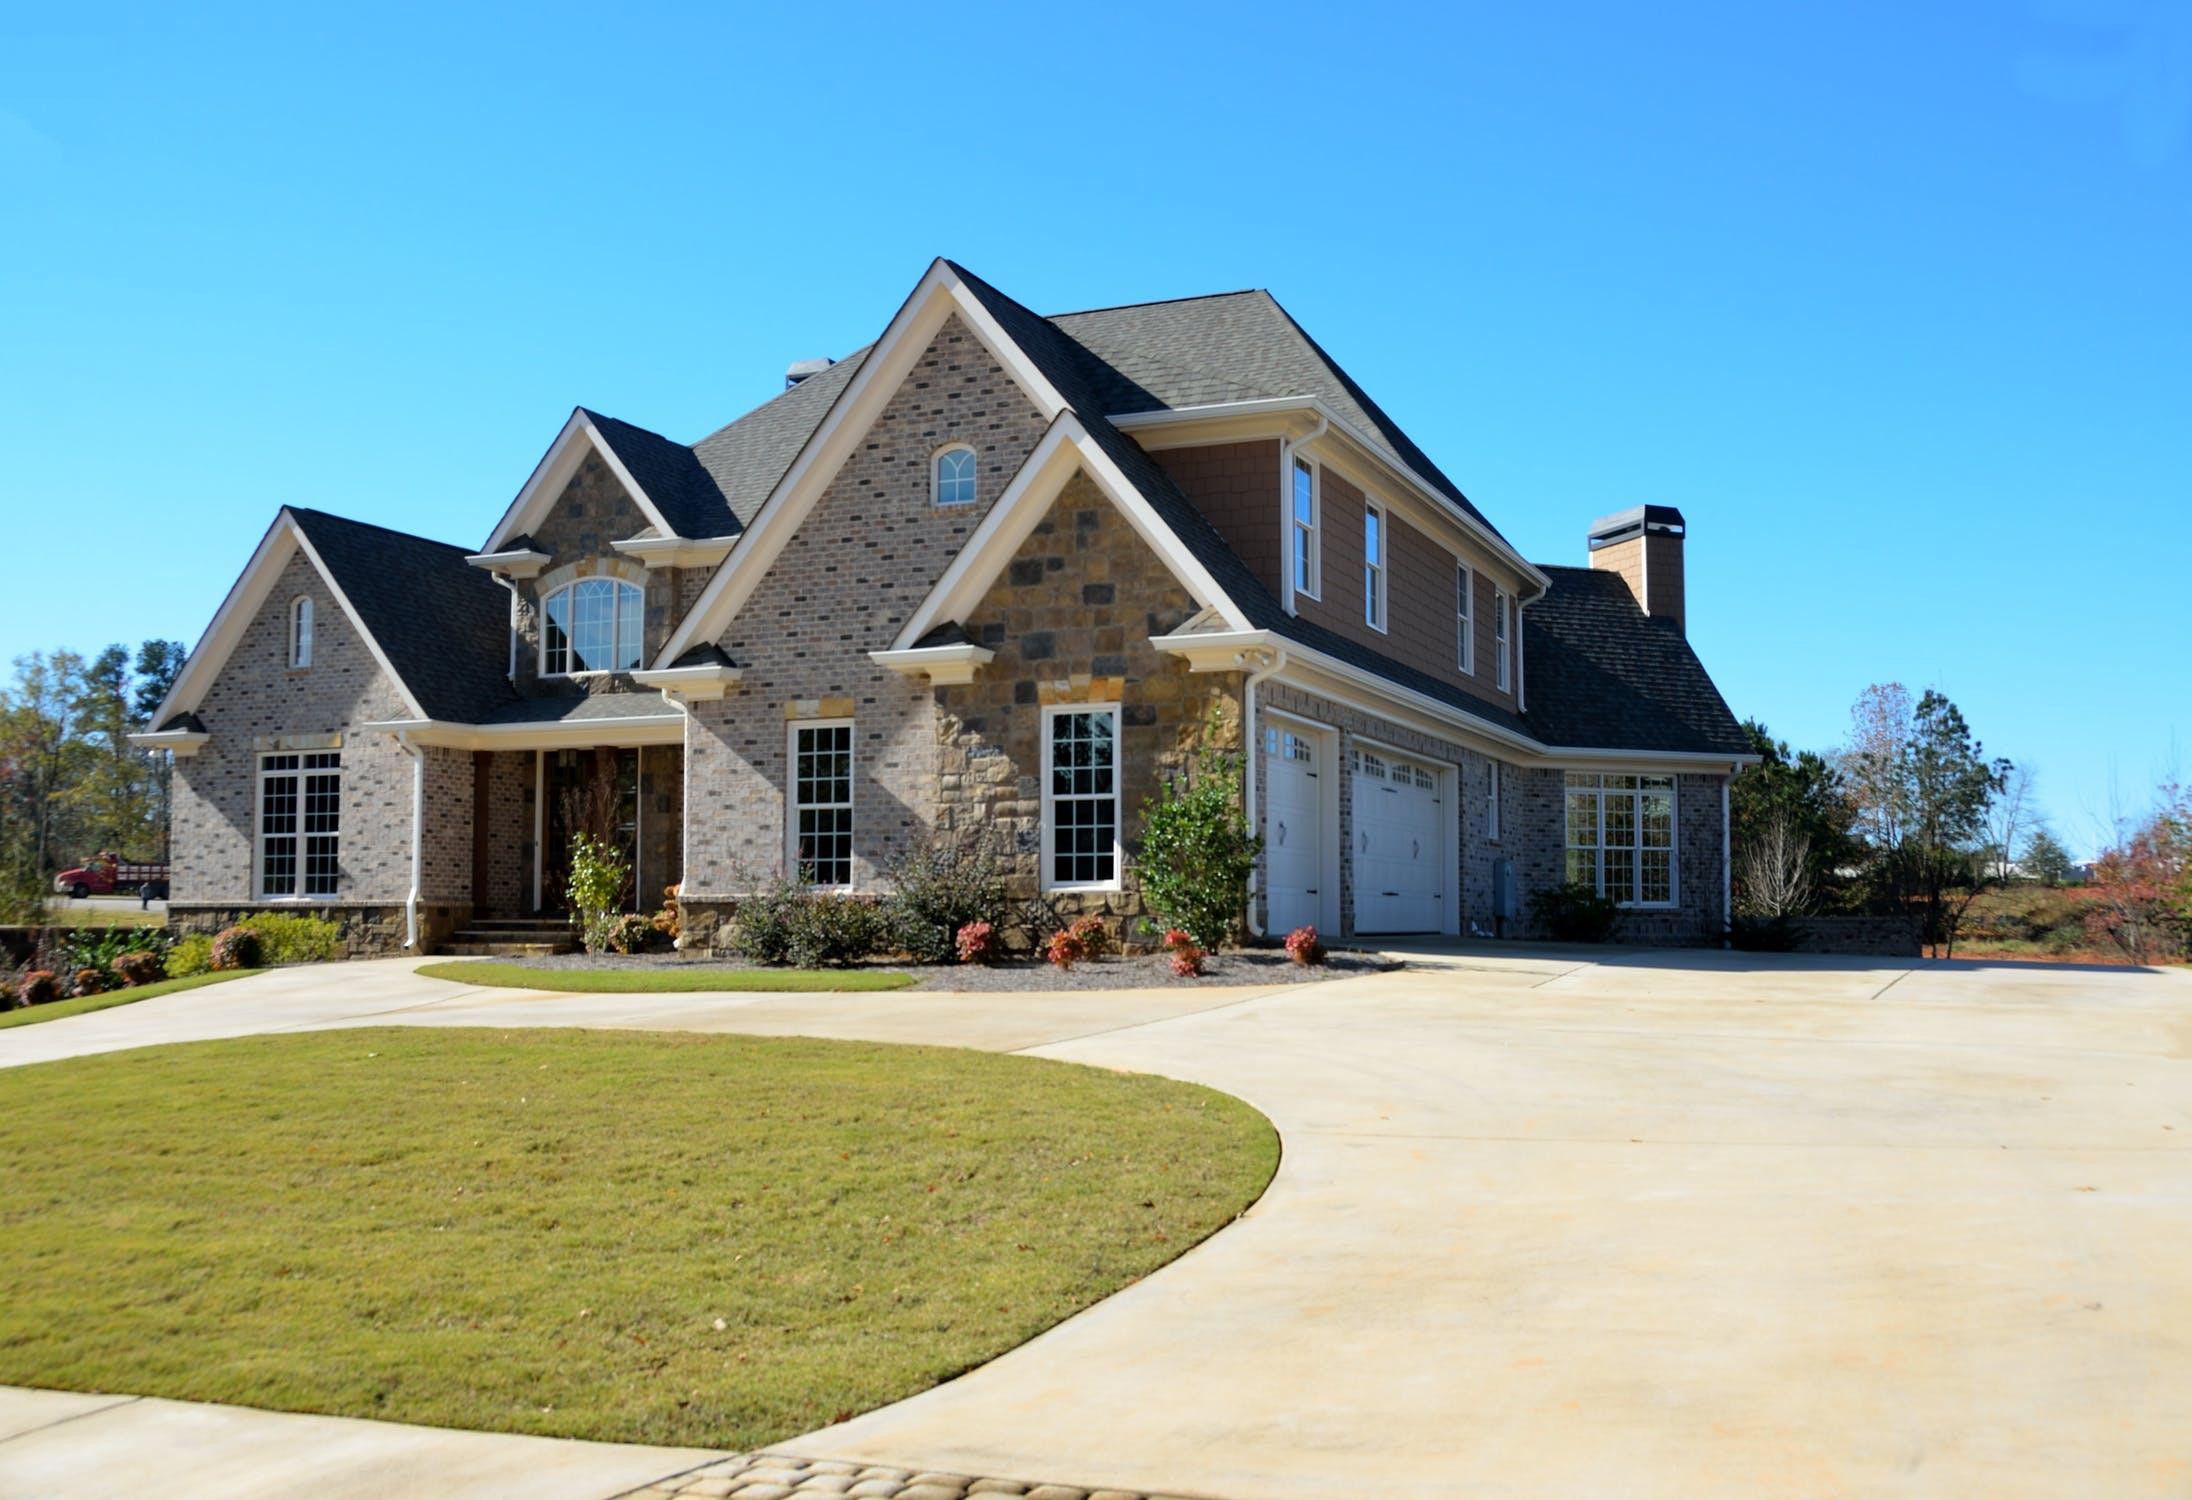 a large suburban house